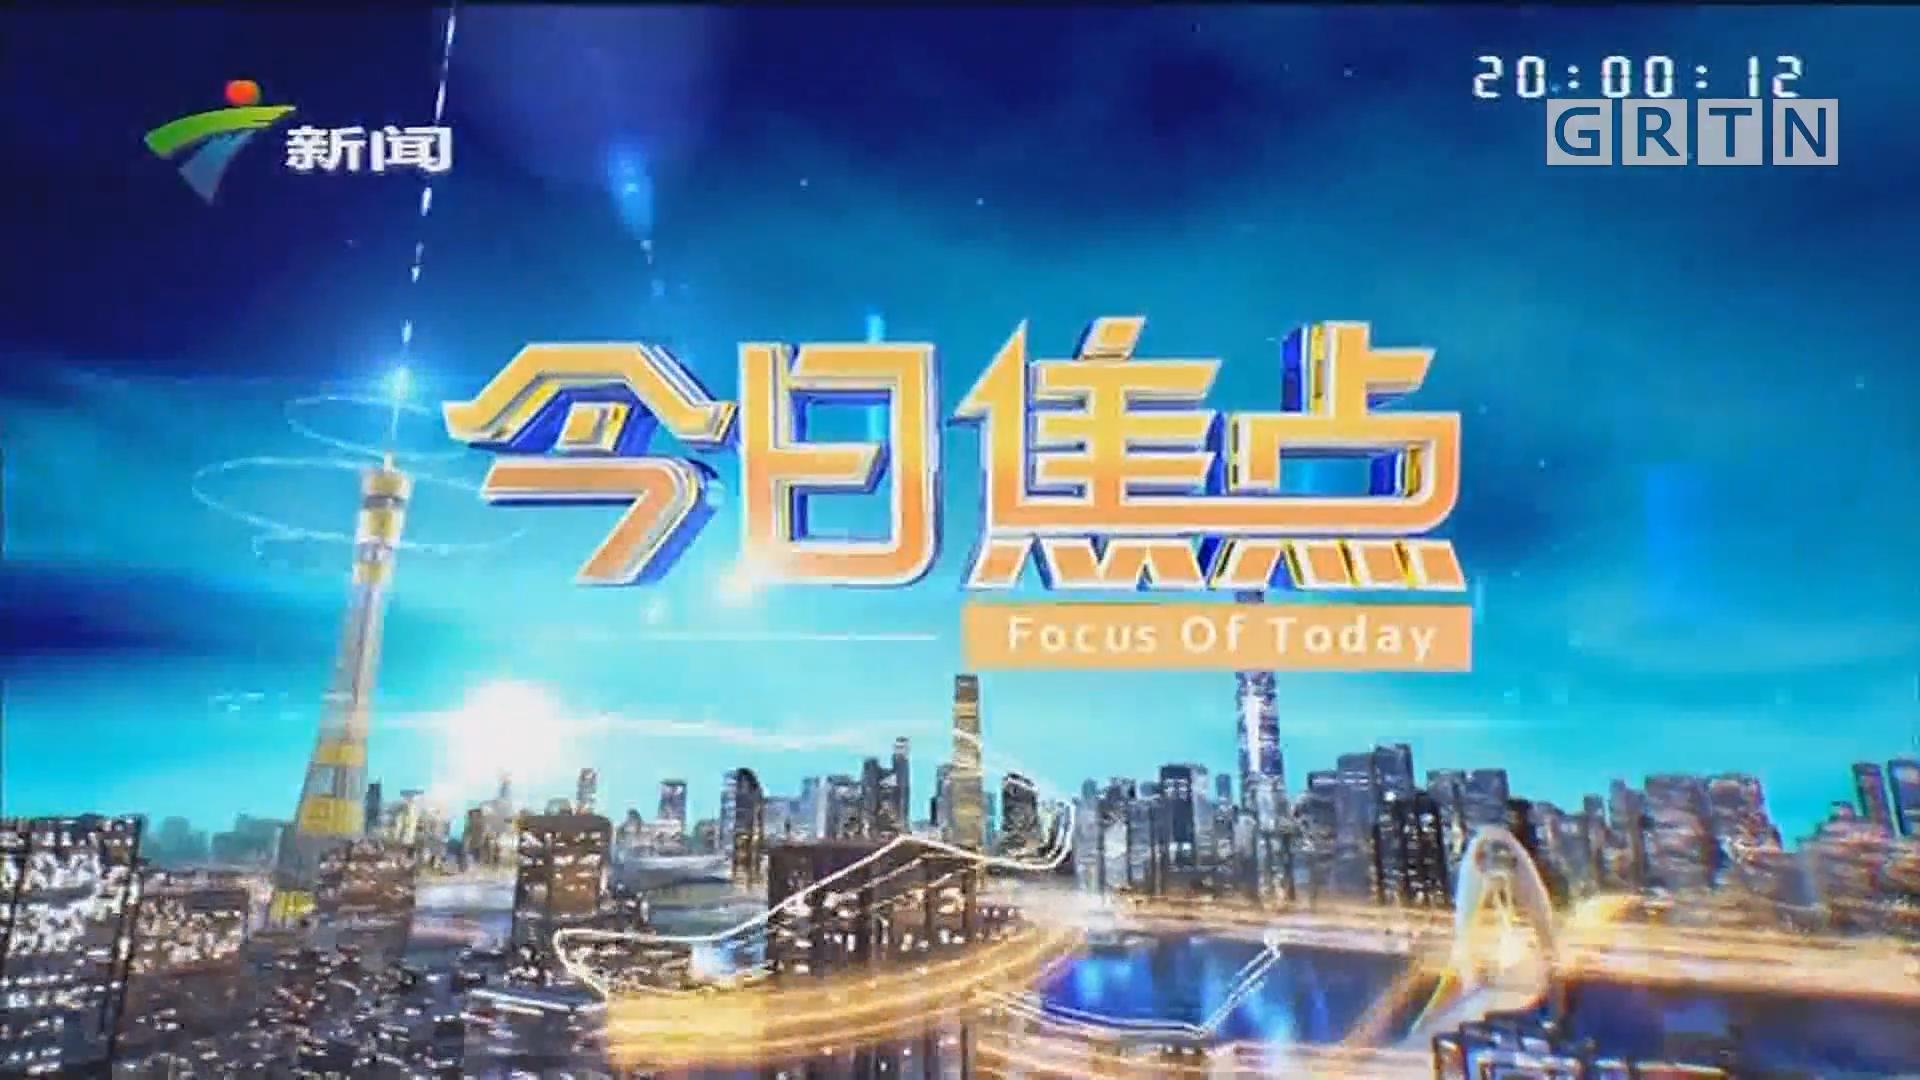 [HD][2019-07-24]今日焦点:贵州:连日大雨 贵州两地发生山体滑坡 多人遇难